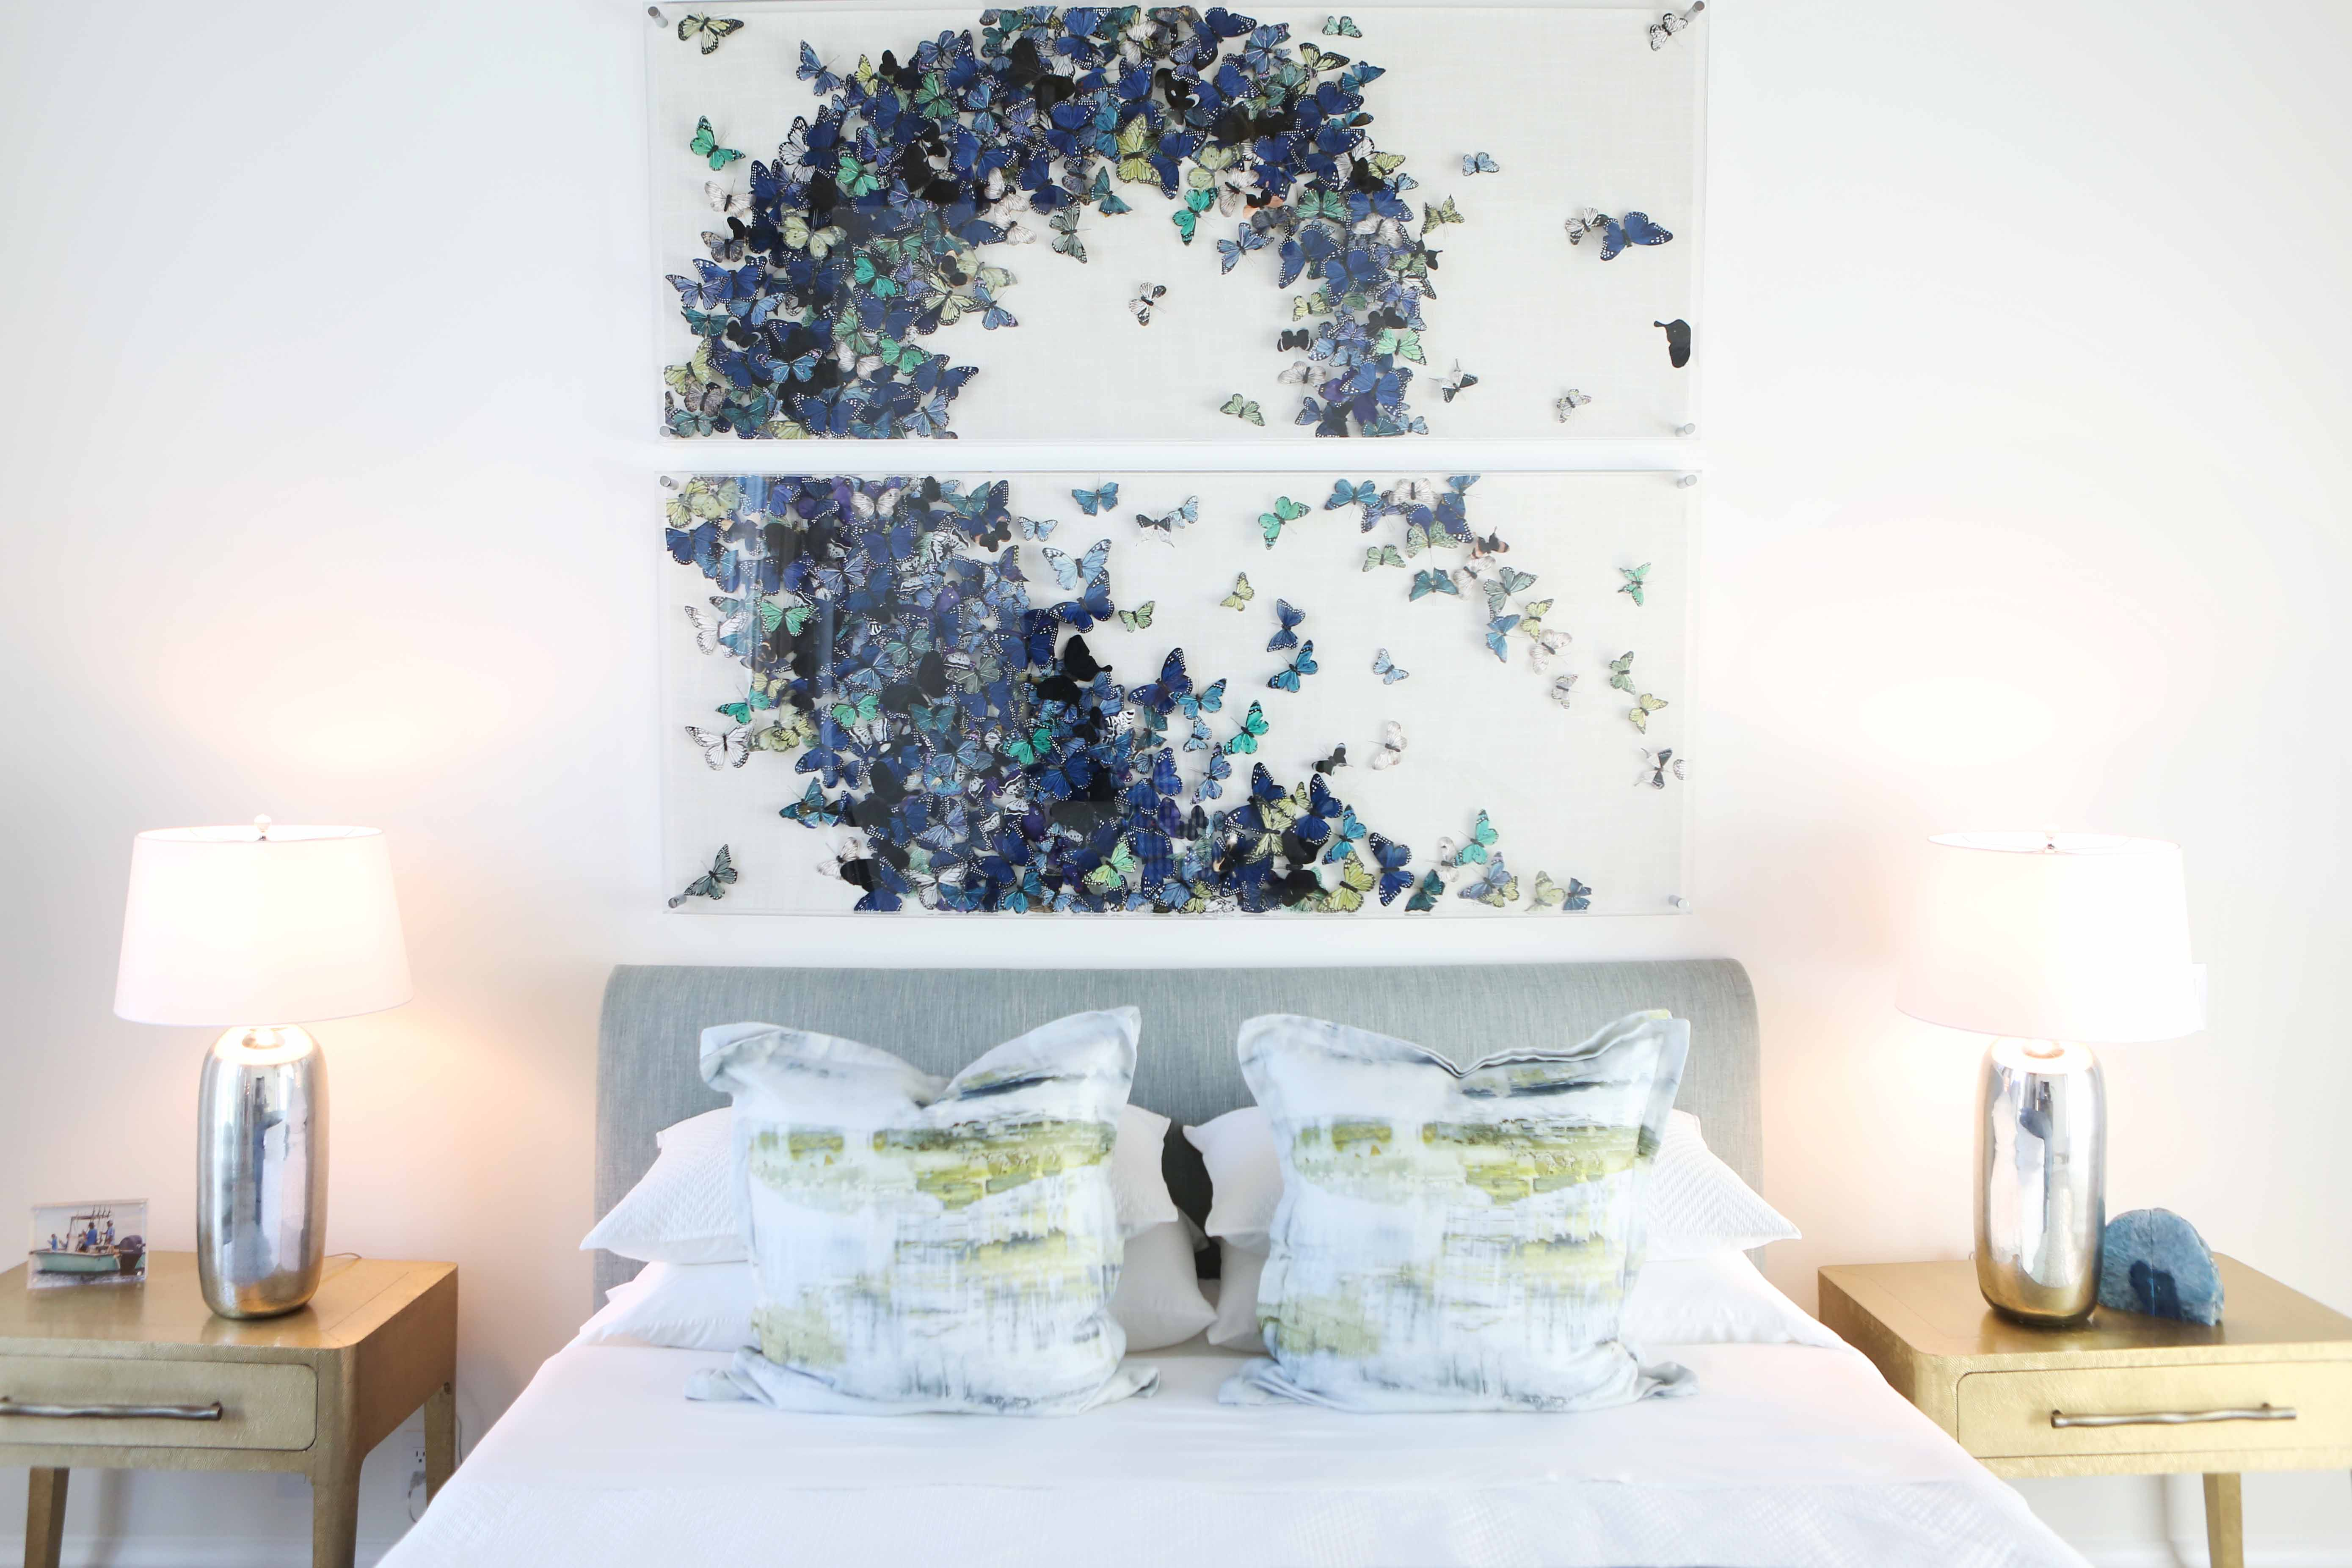 Jeffrey Fisher Home Luxury Interior Design Imagined Home Decor Butterfly Art Custom Master Bedroom D